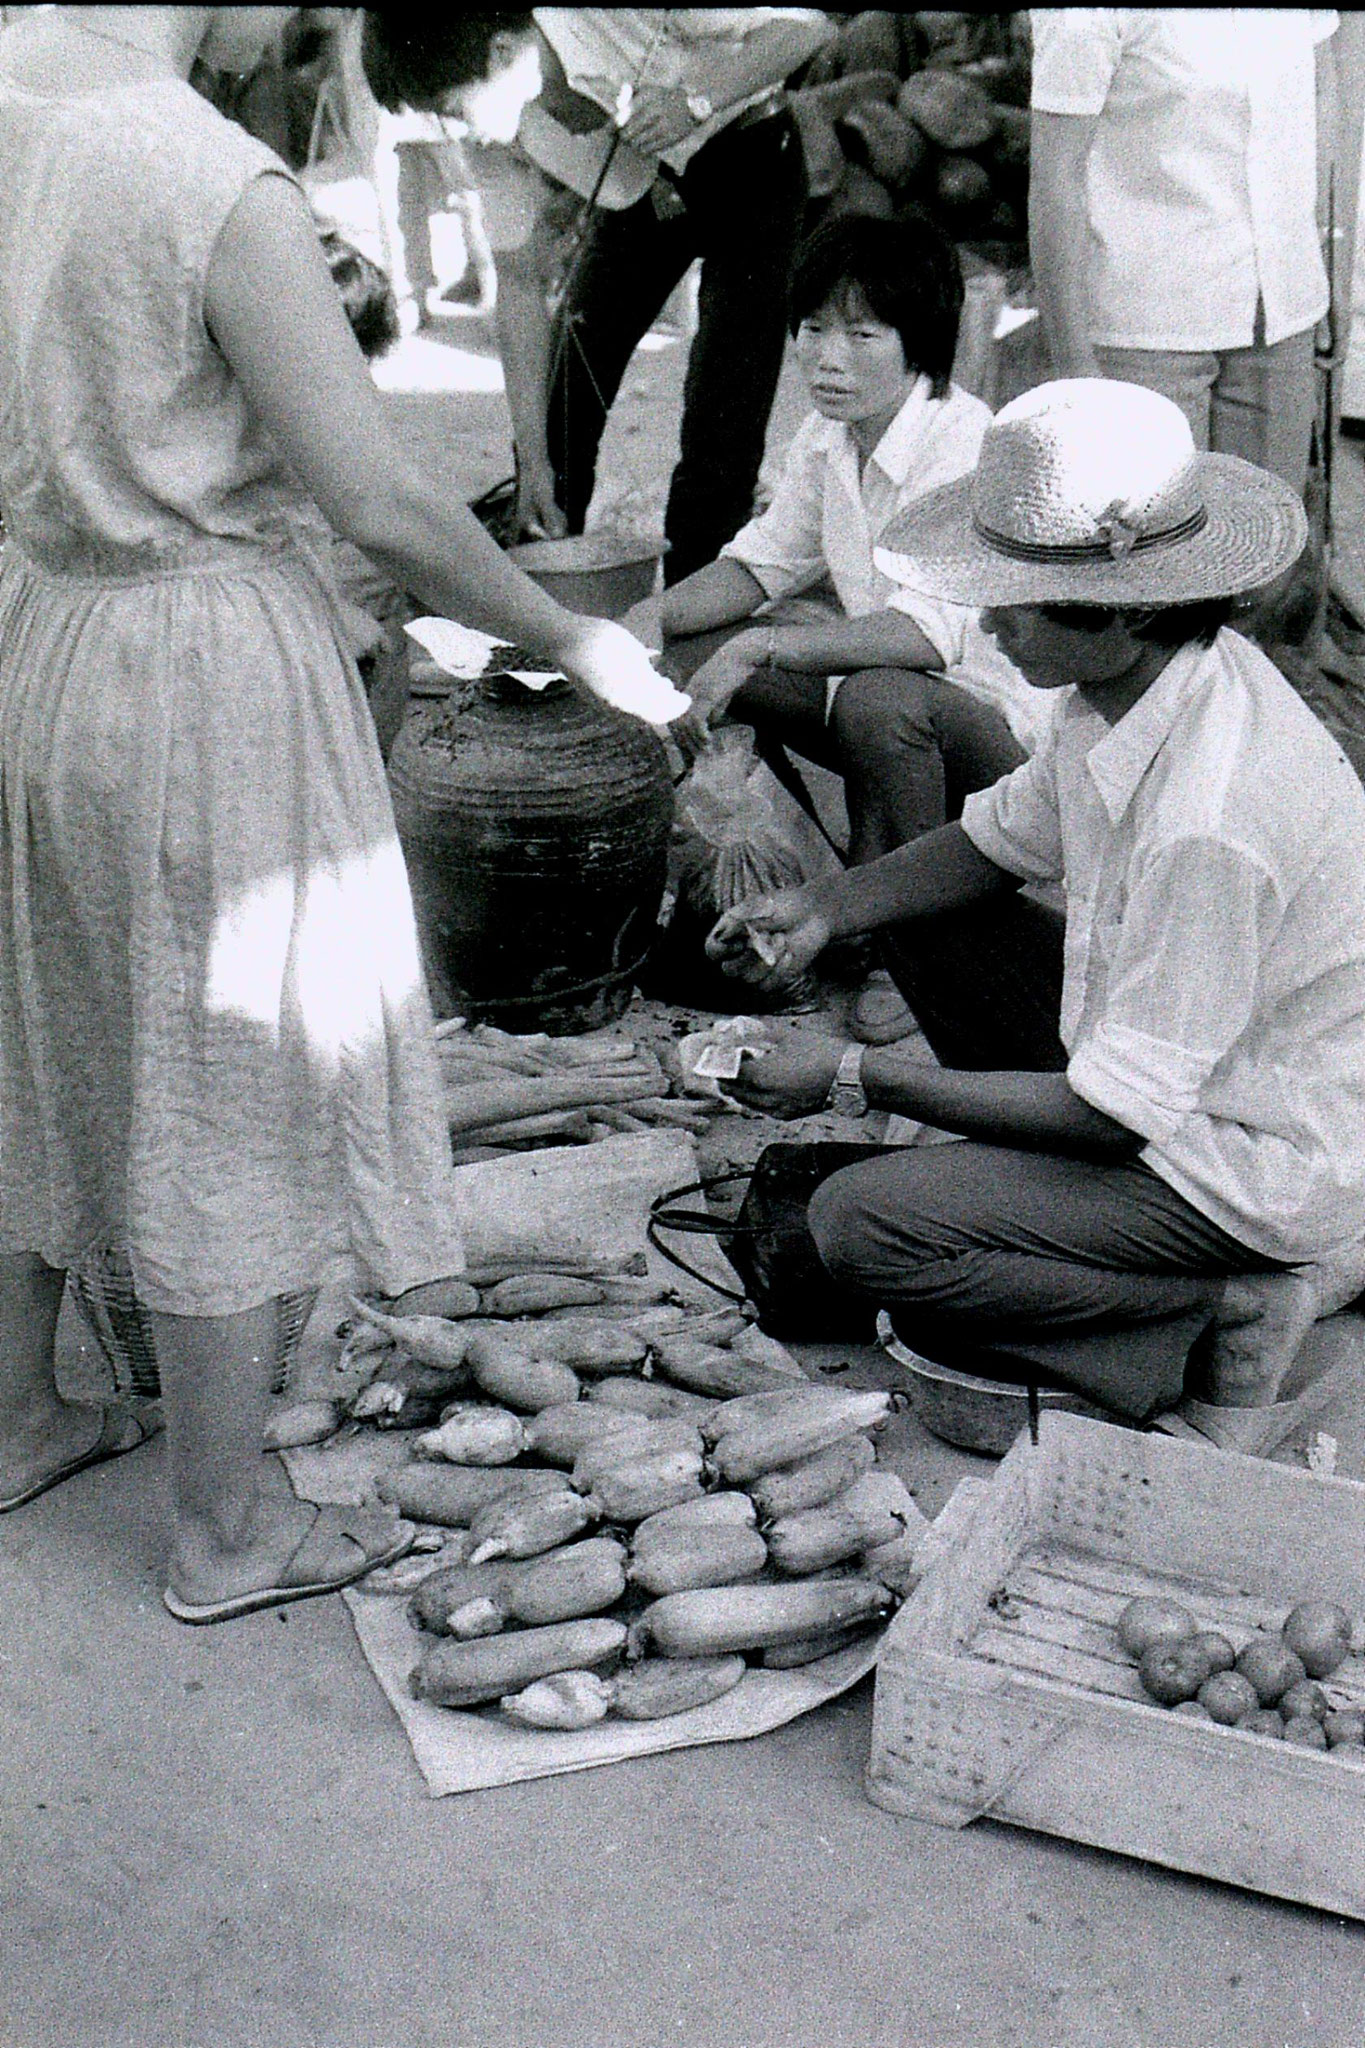 19/7/1989: 23: Zheda Free market